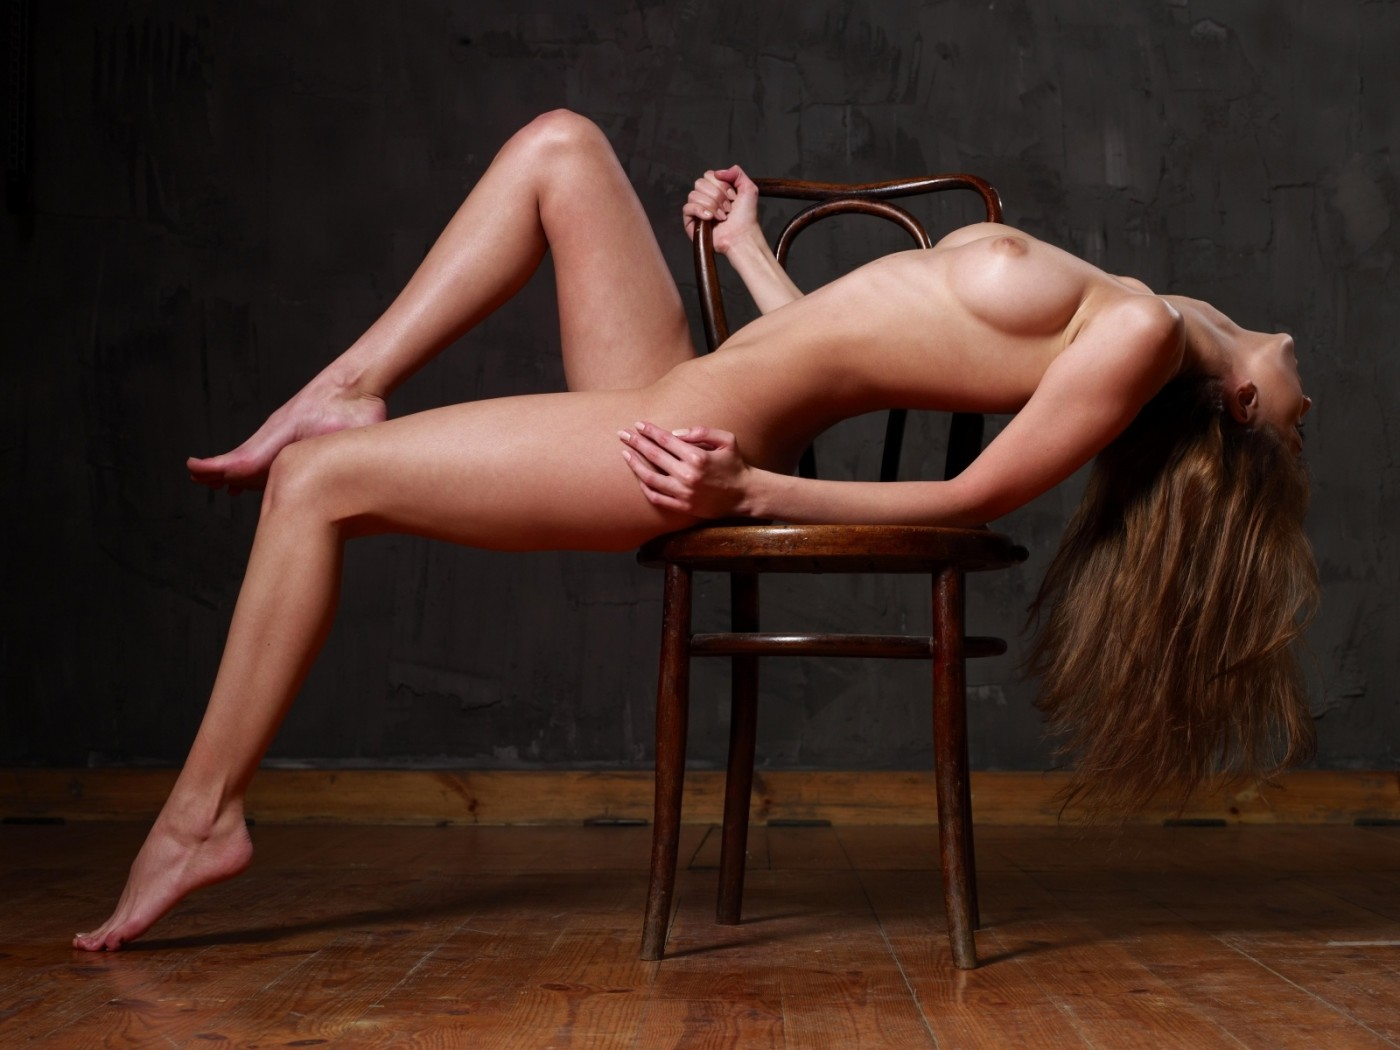 Стриптиз за барным стулом, Стриптиз на стуле - видео Yo-Sex 10 фотография